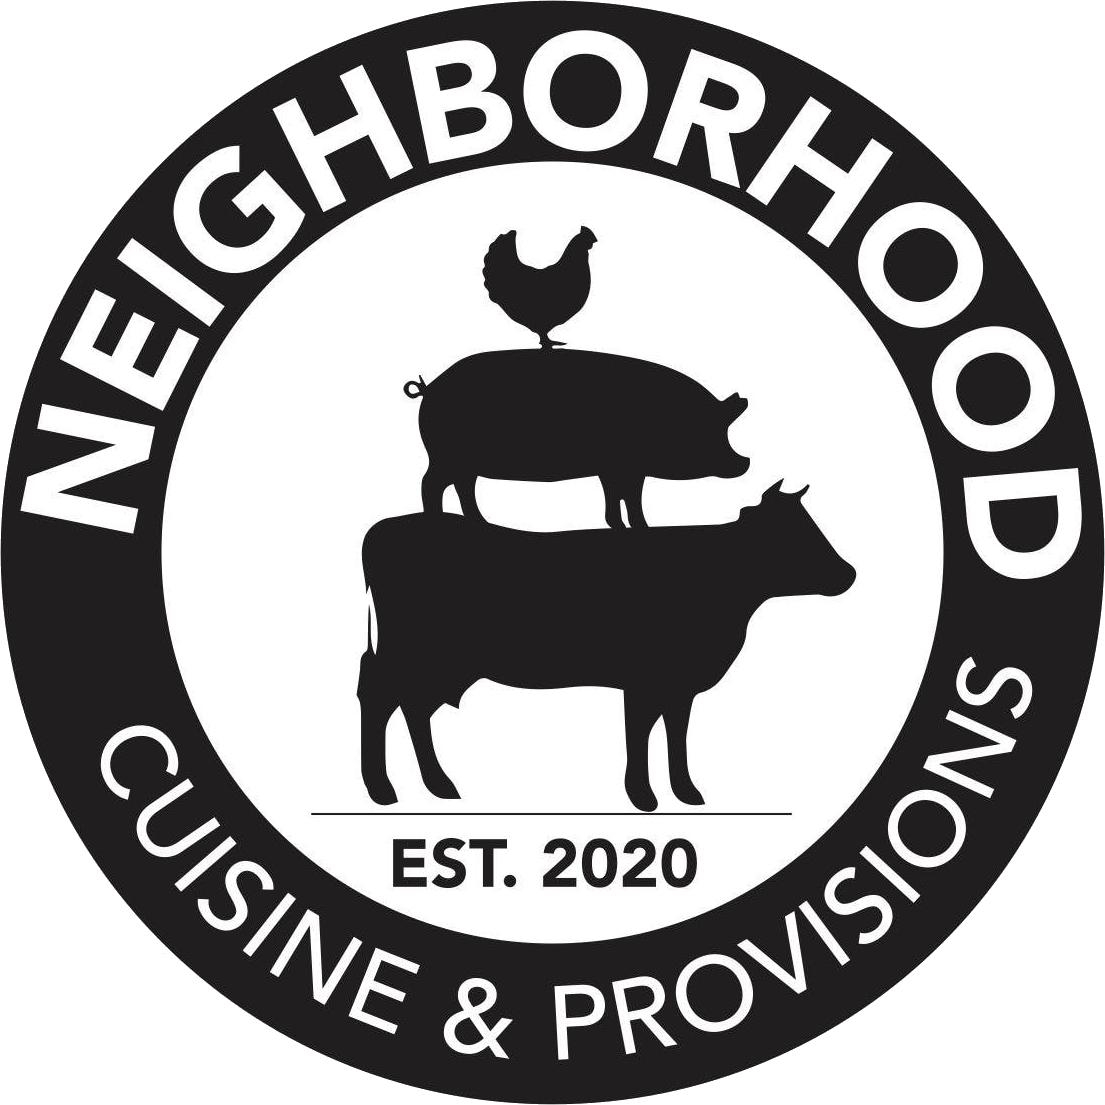 Neighborhood Cuisine & Provisions Home